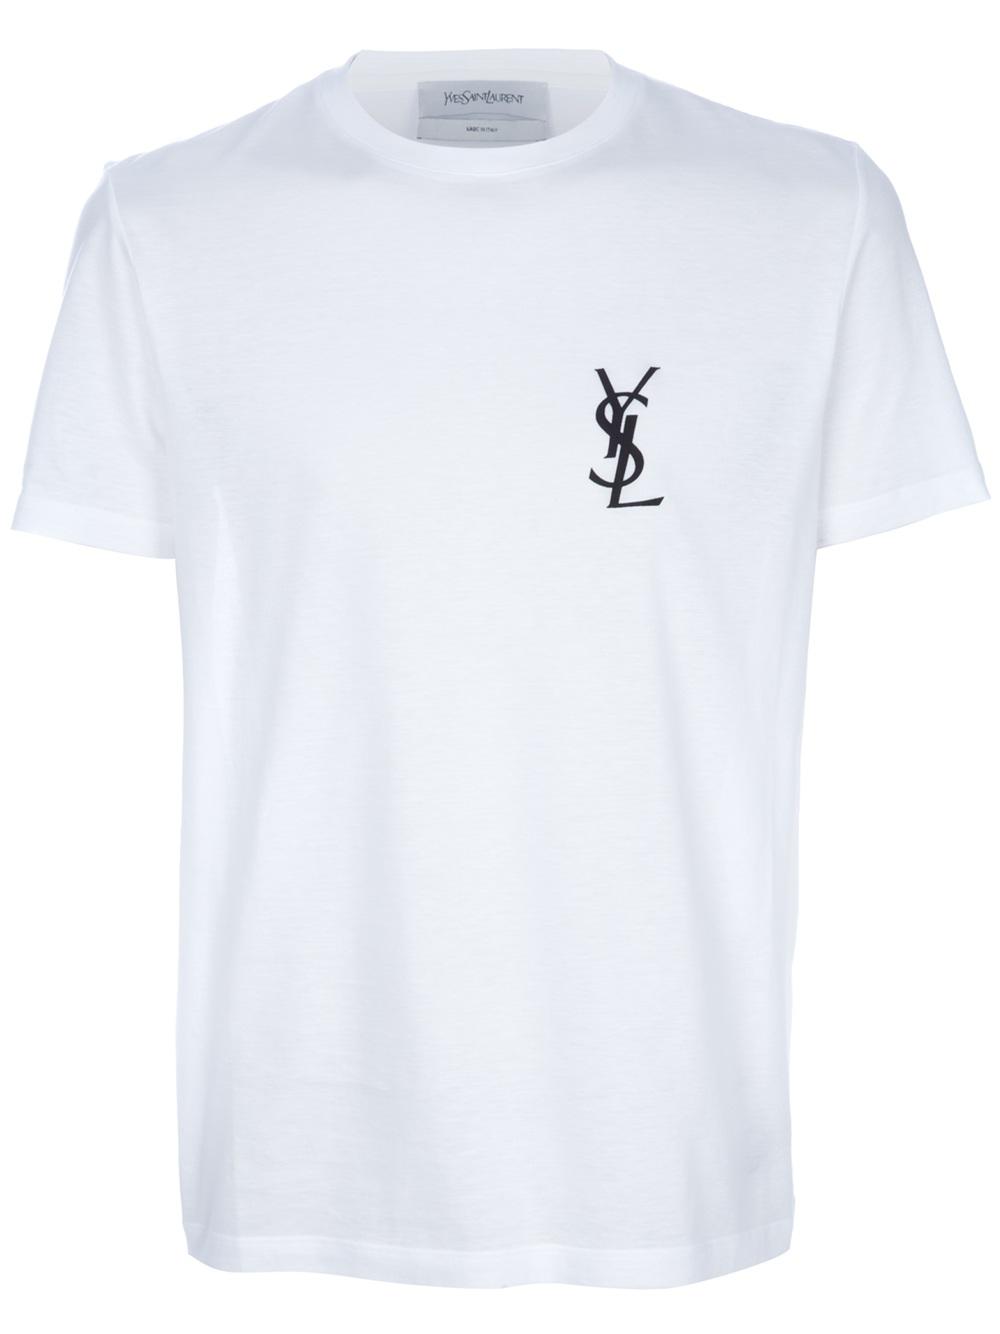 saint laurent printed t shirt in white for men lyst. Black Bedroom Furniture Sets. Home Design Ideas